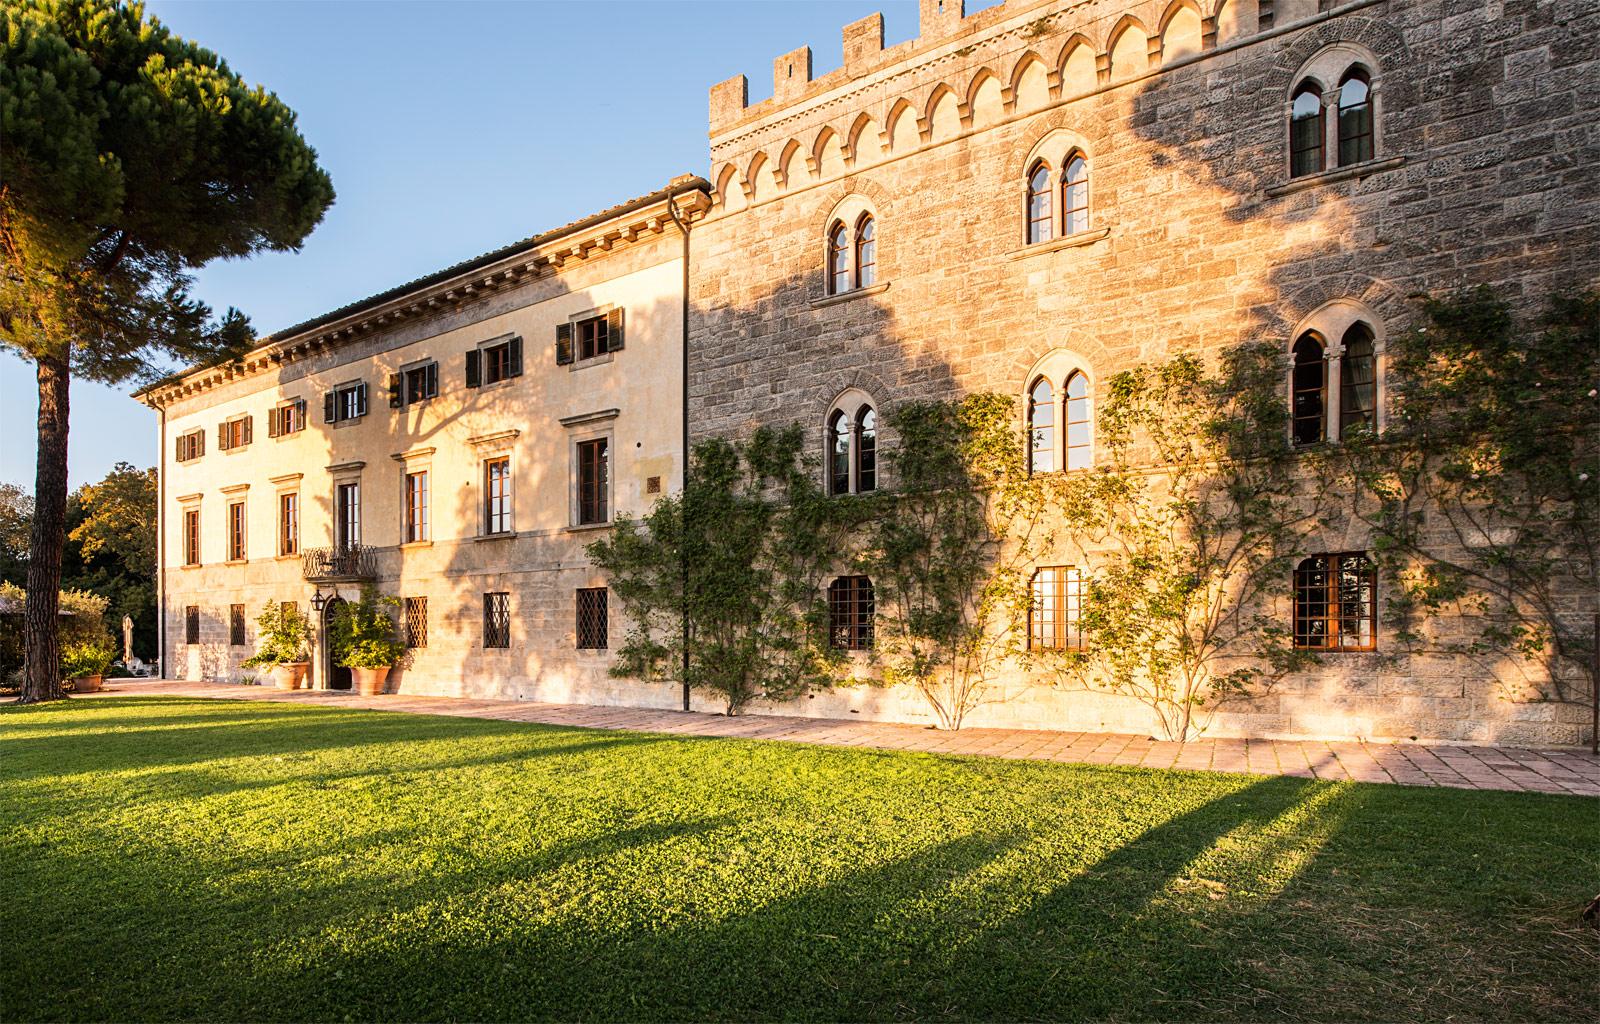 Luxury Hotel Borgo Pignano Brings Vitalità To Tuscany